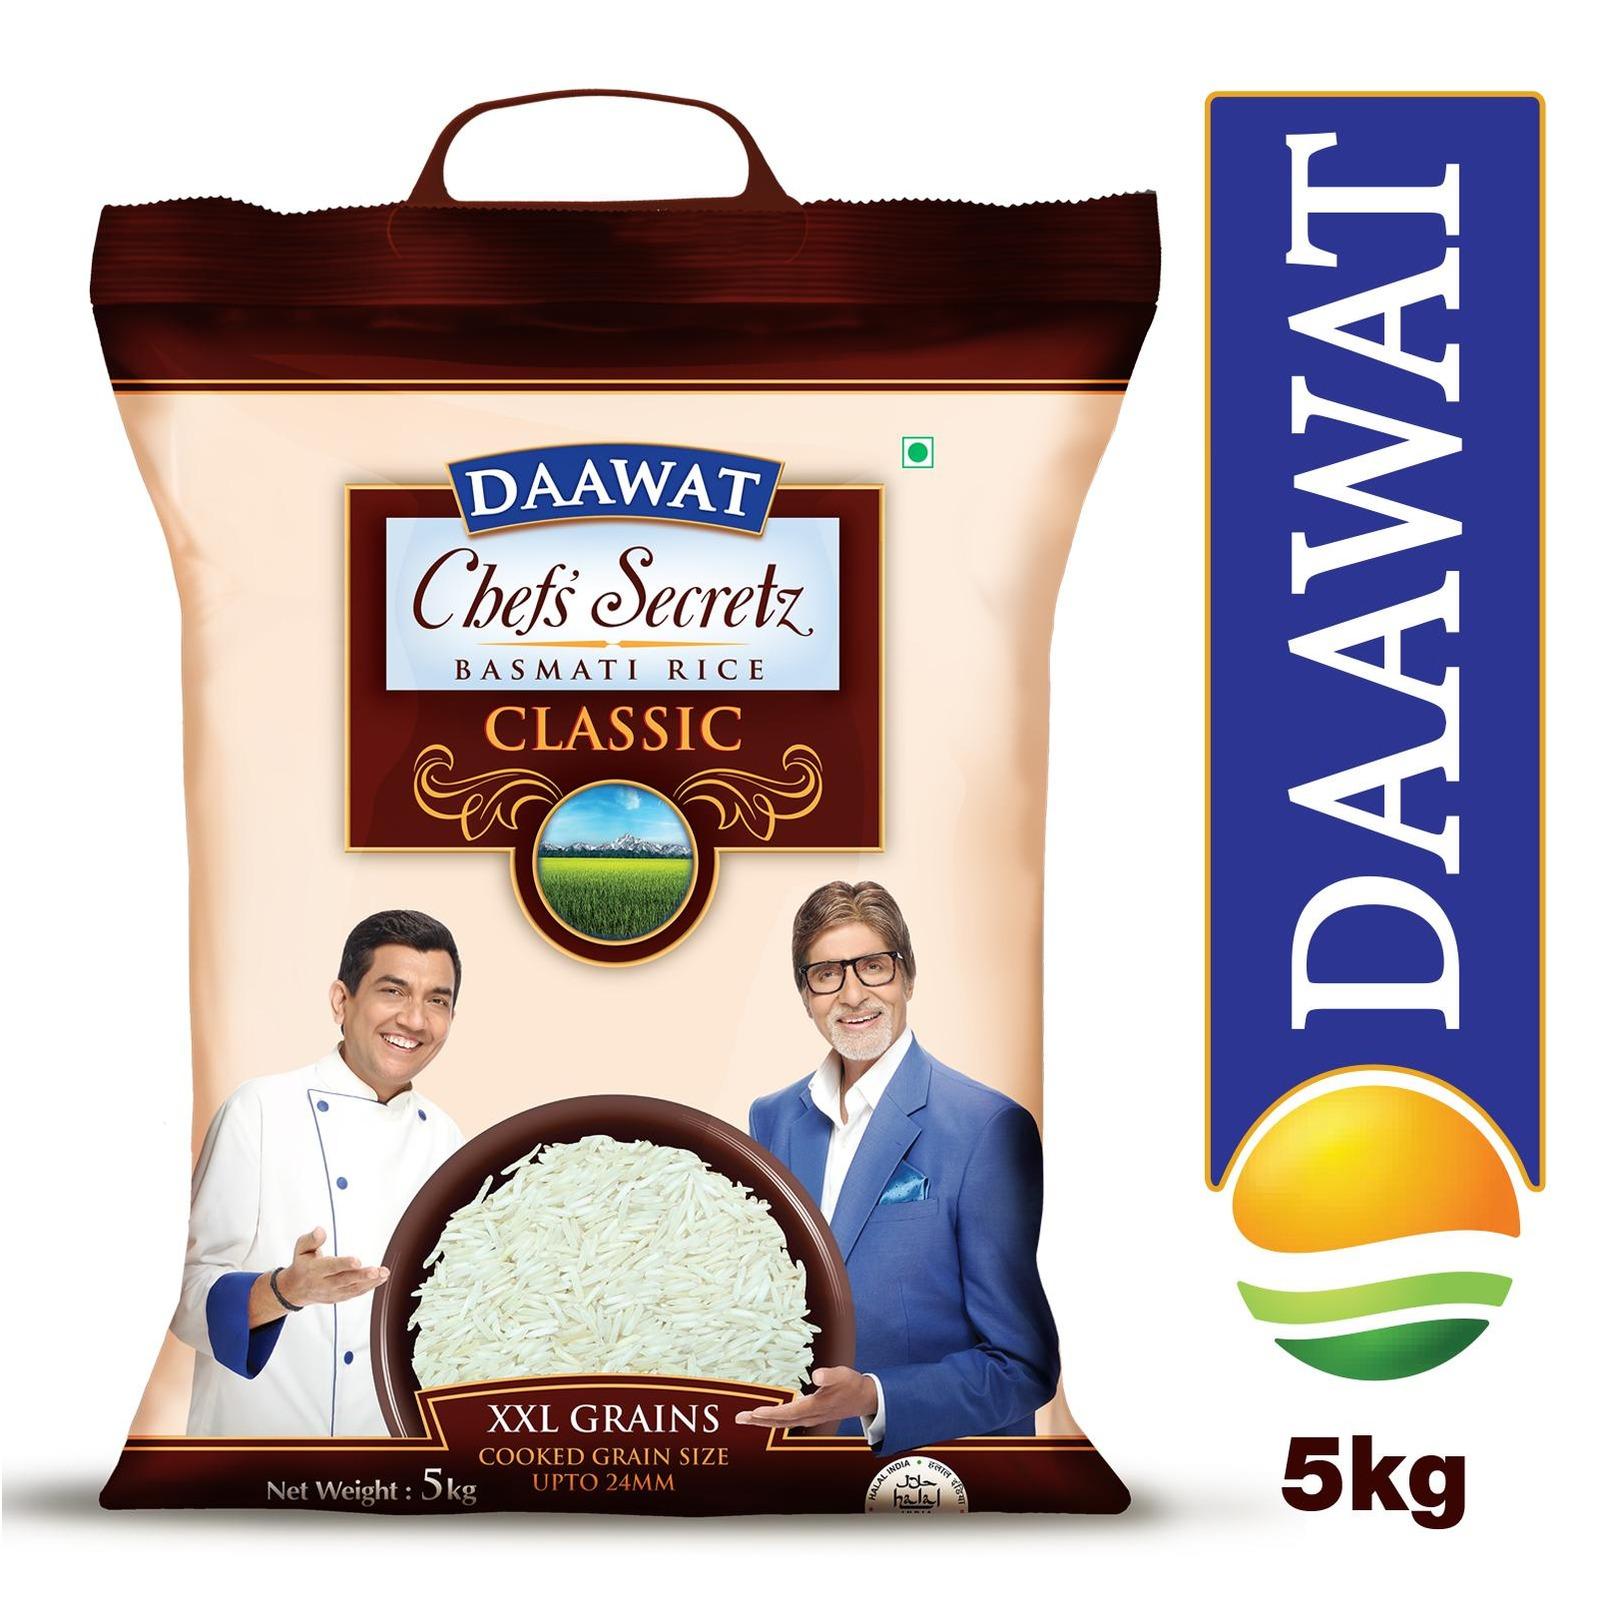 Daawat Chef's Secretz Classic Basmati Rice - By Sonnamera